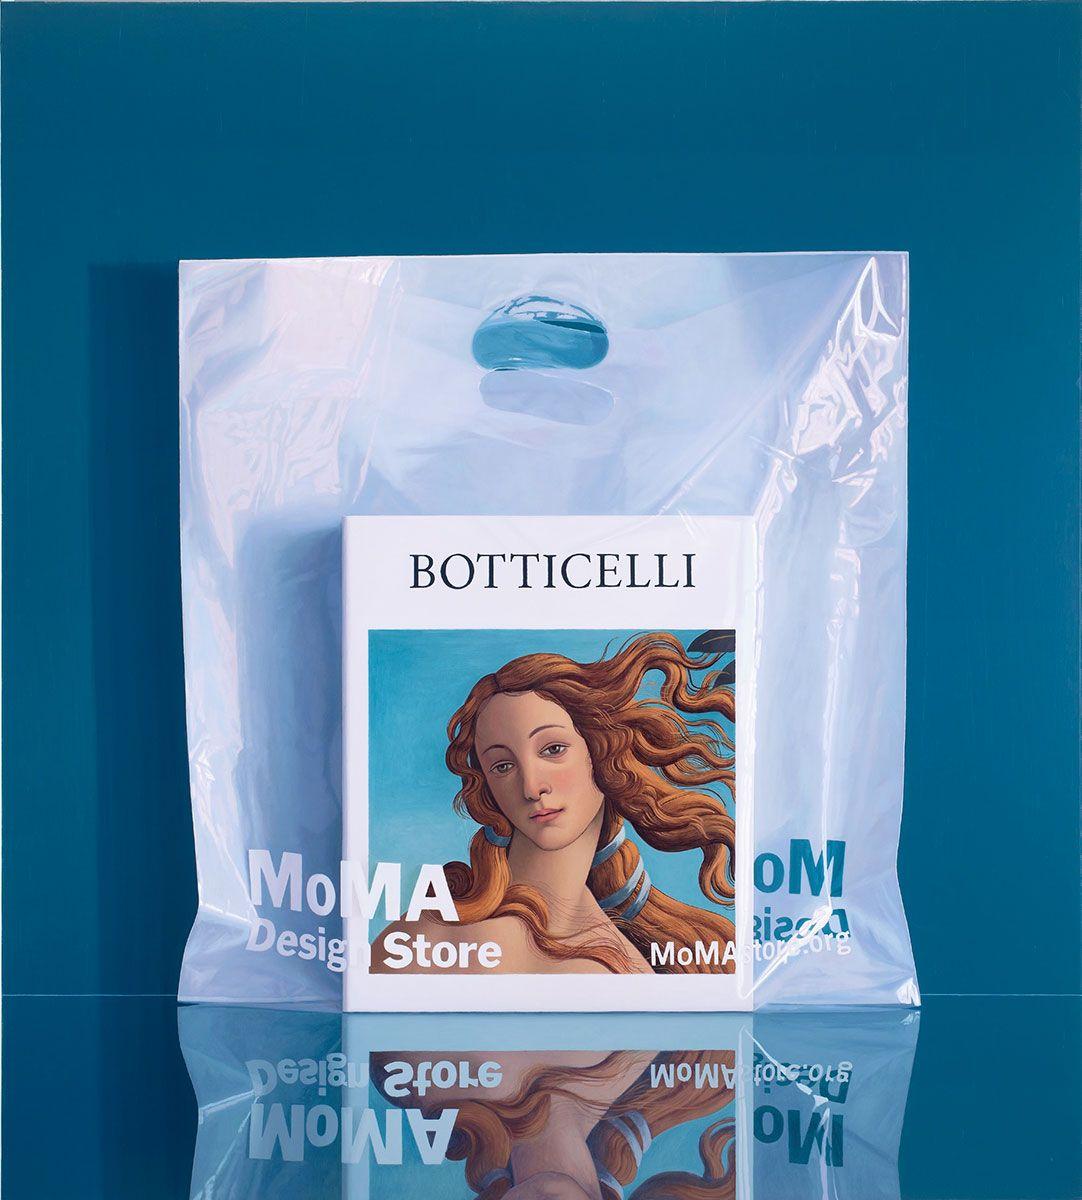 Botticelli-MOMA-Carlos-Vega-Faundez